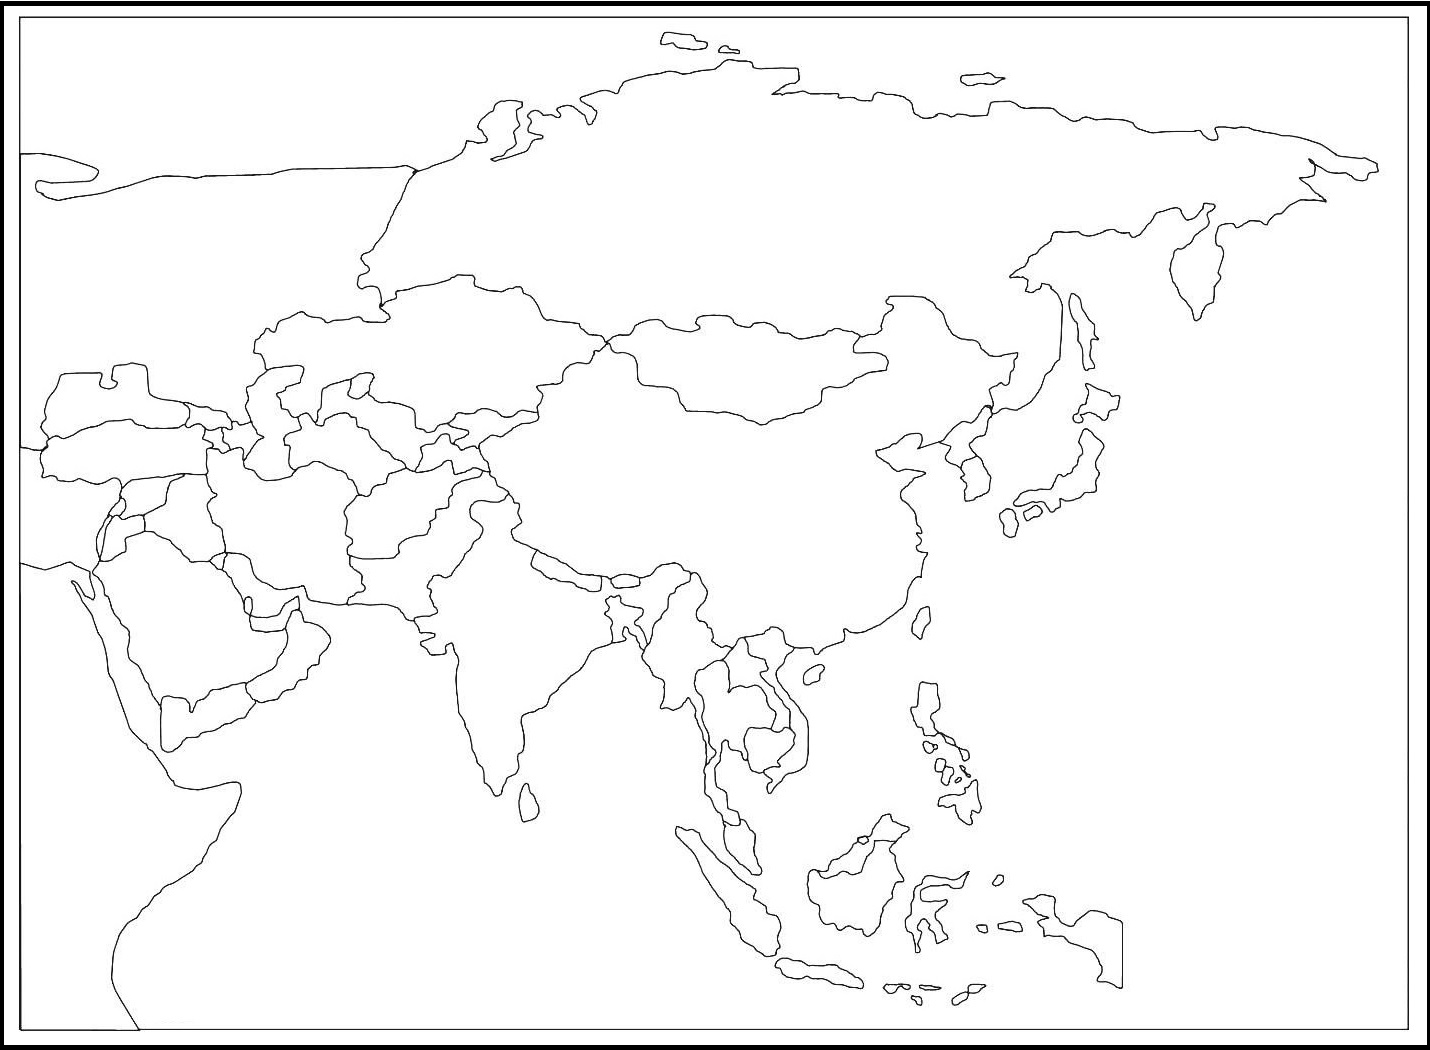 Mapa De Asia Mudo.Mapa De Asia Politico Mapa Continente Asiatico 2019